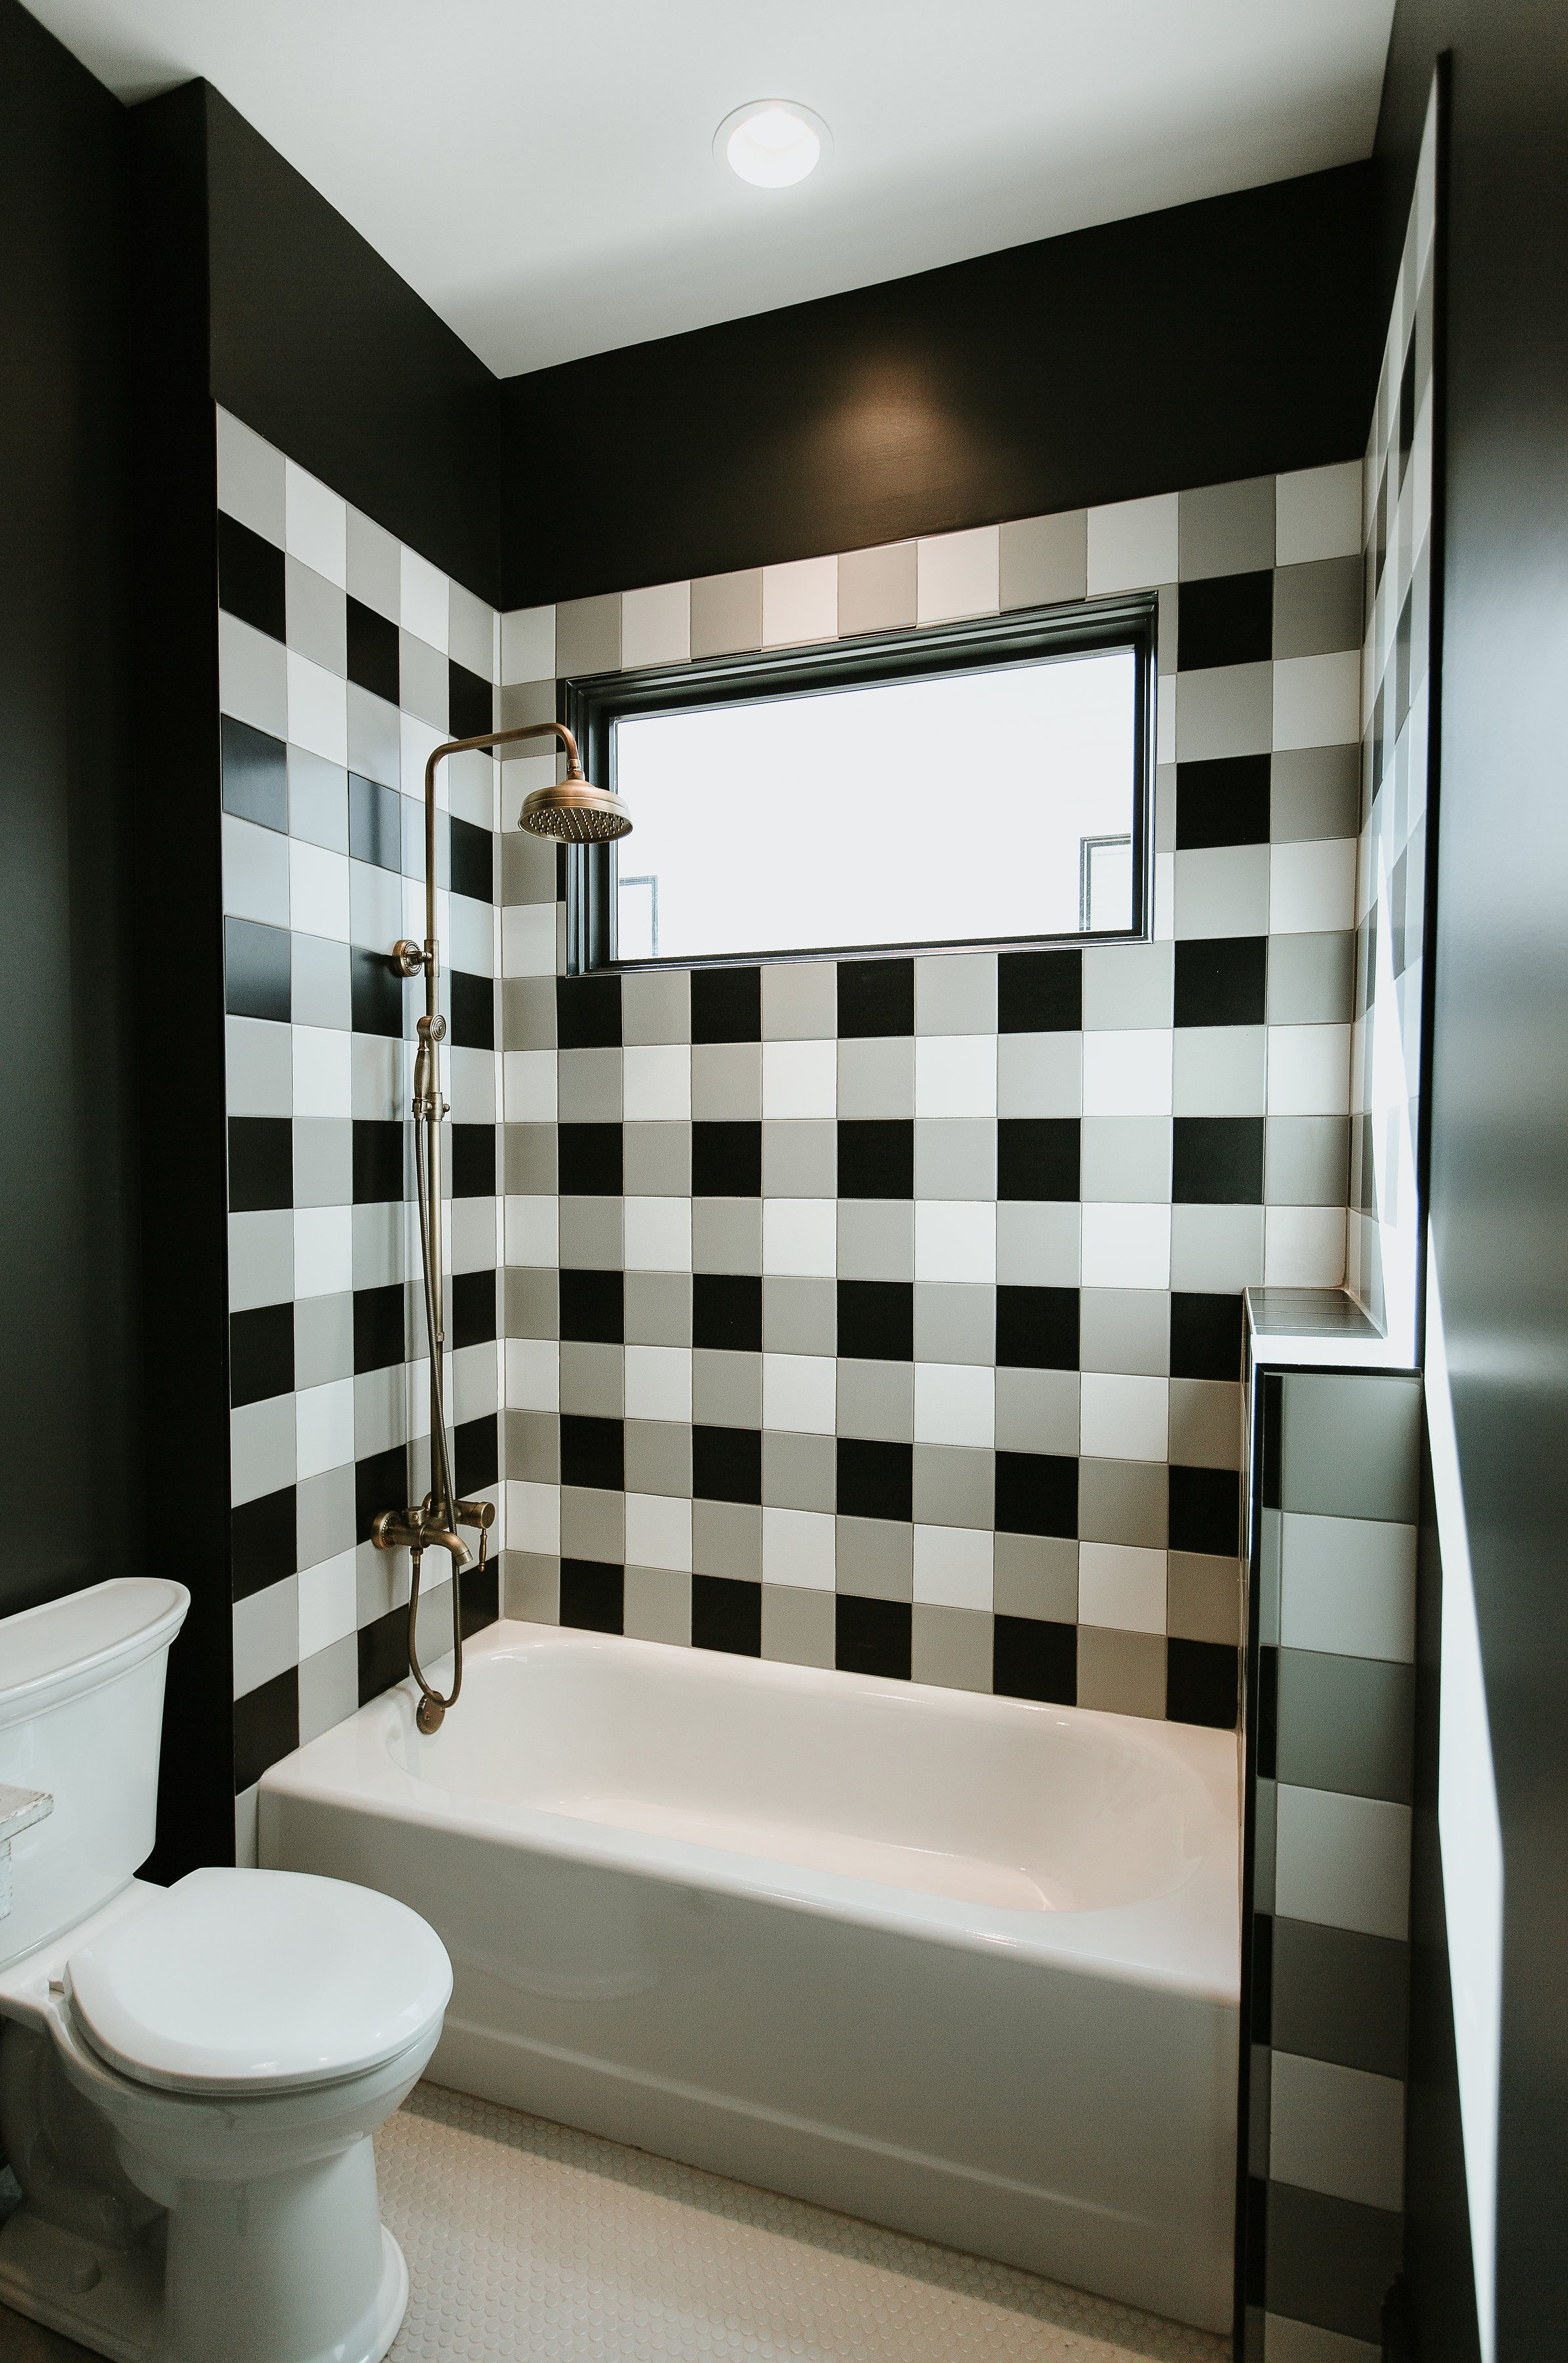 Bathroom at Mike Stevens Homes in 8  Bathroom interior design